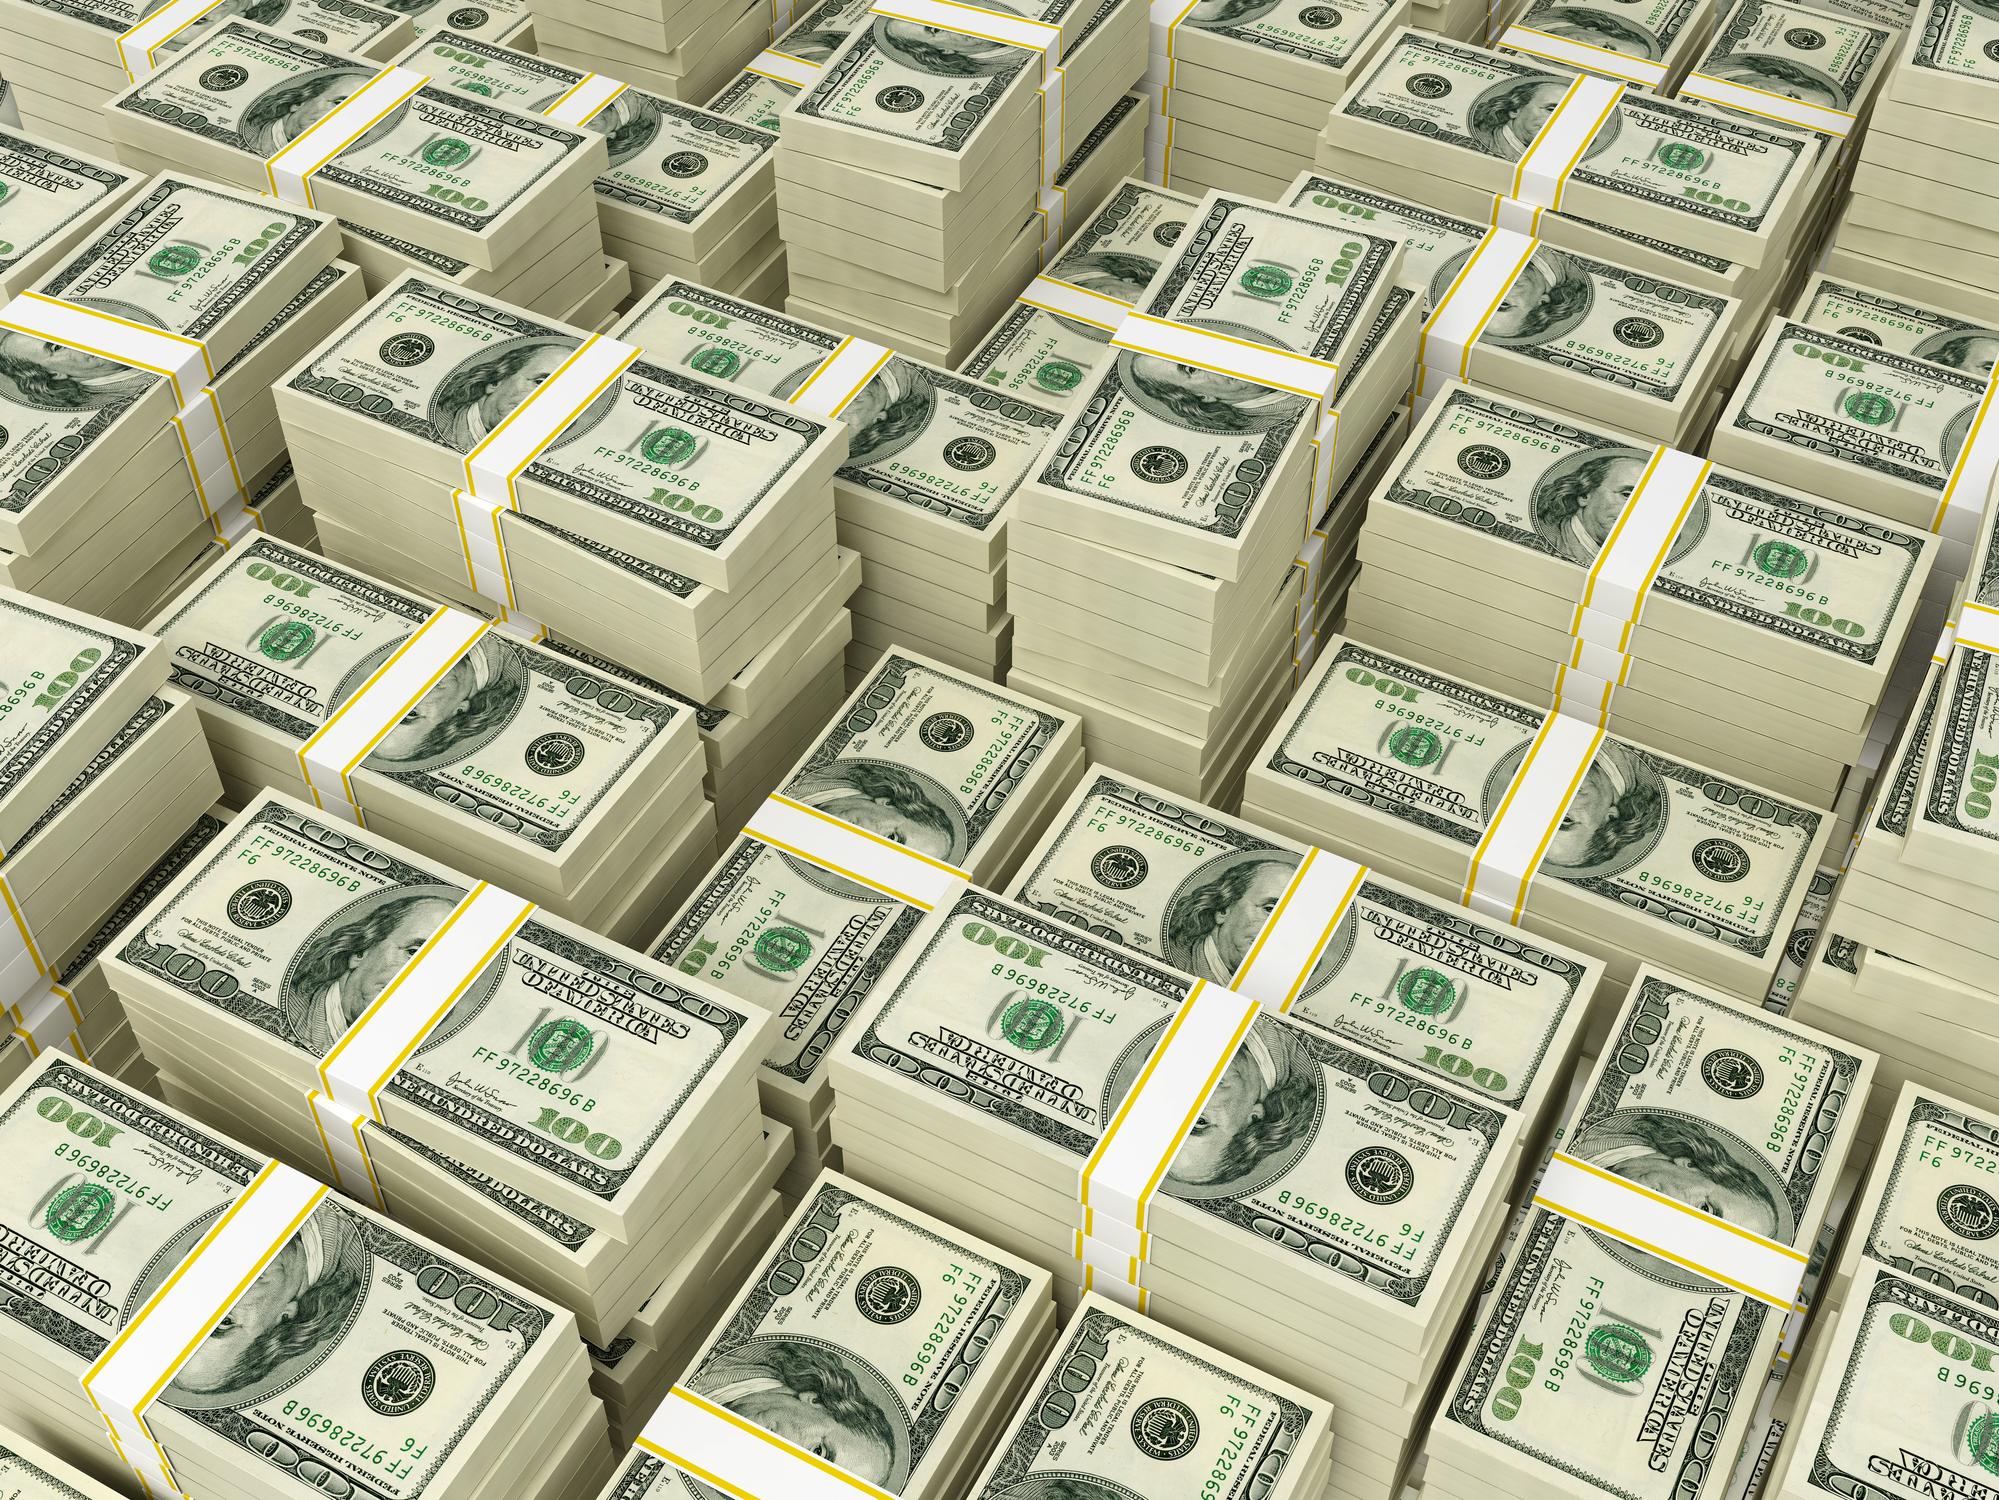 Stacks and stacks of $100 bills.